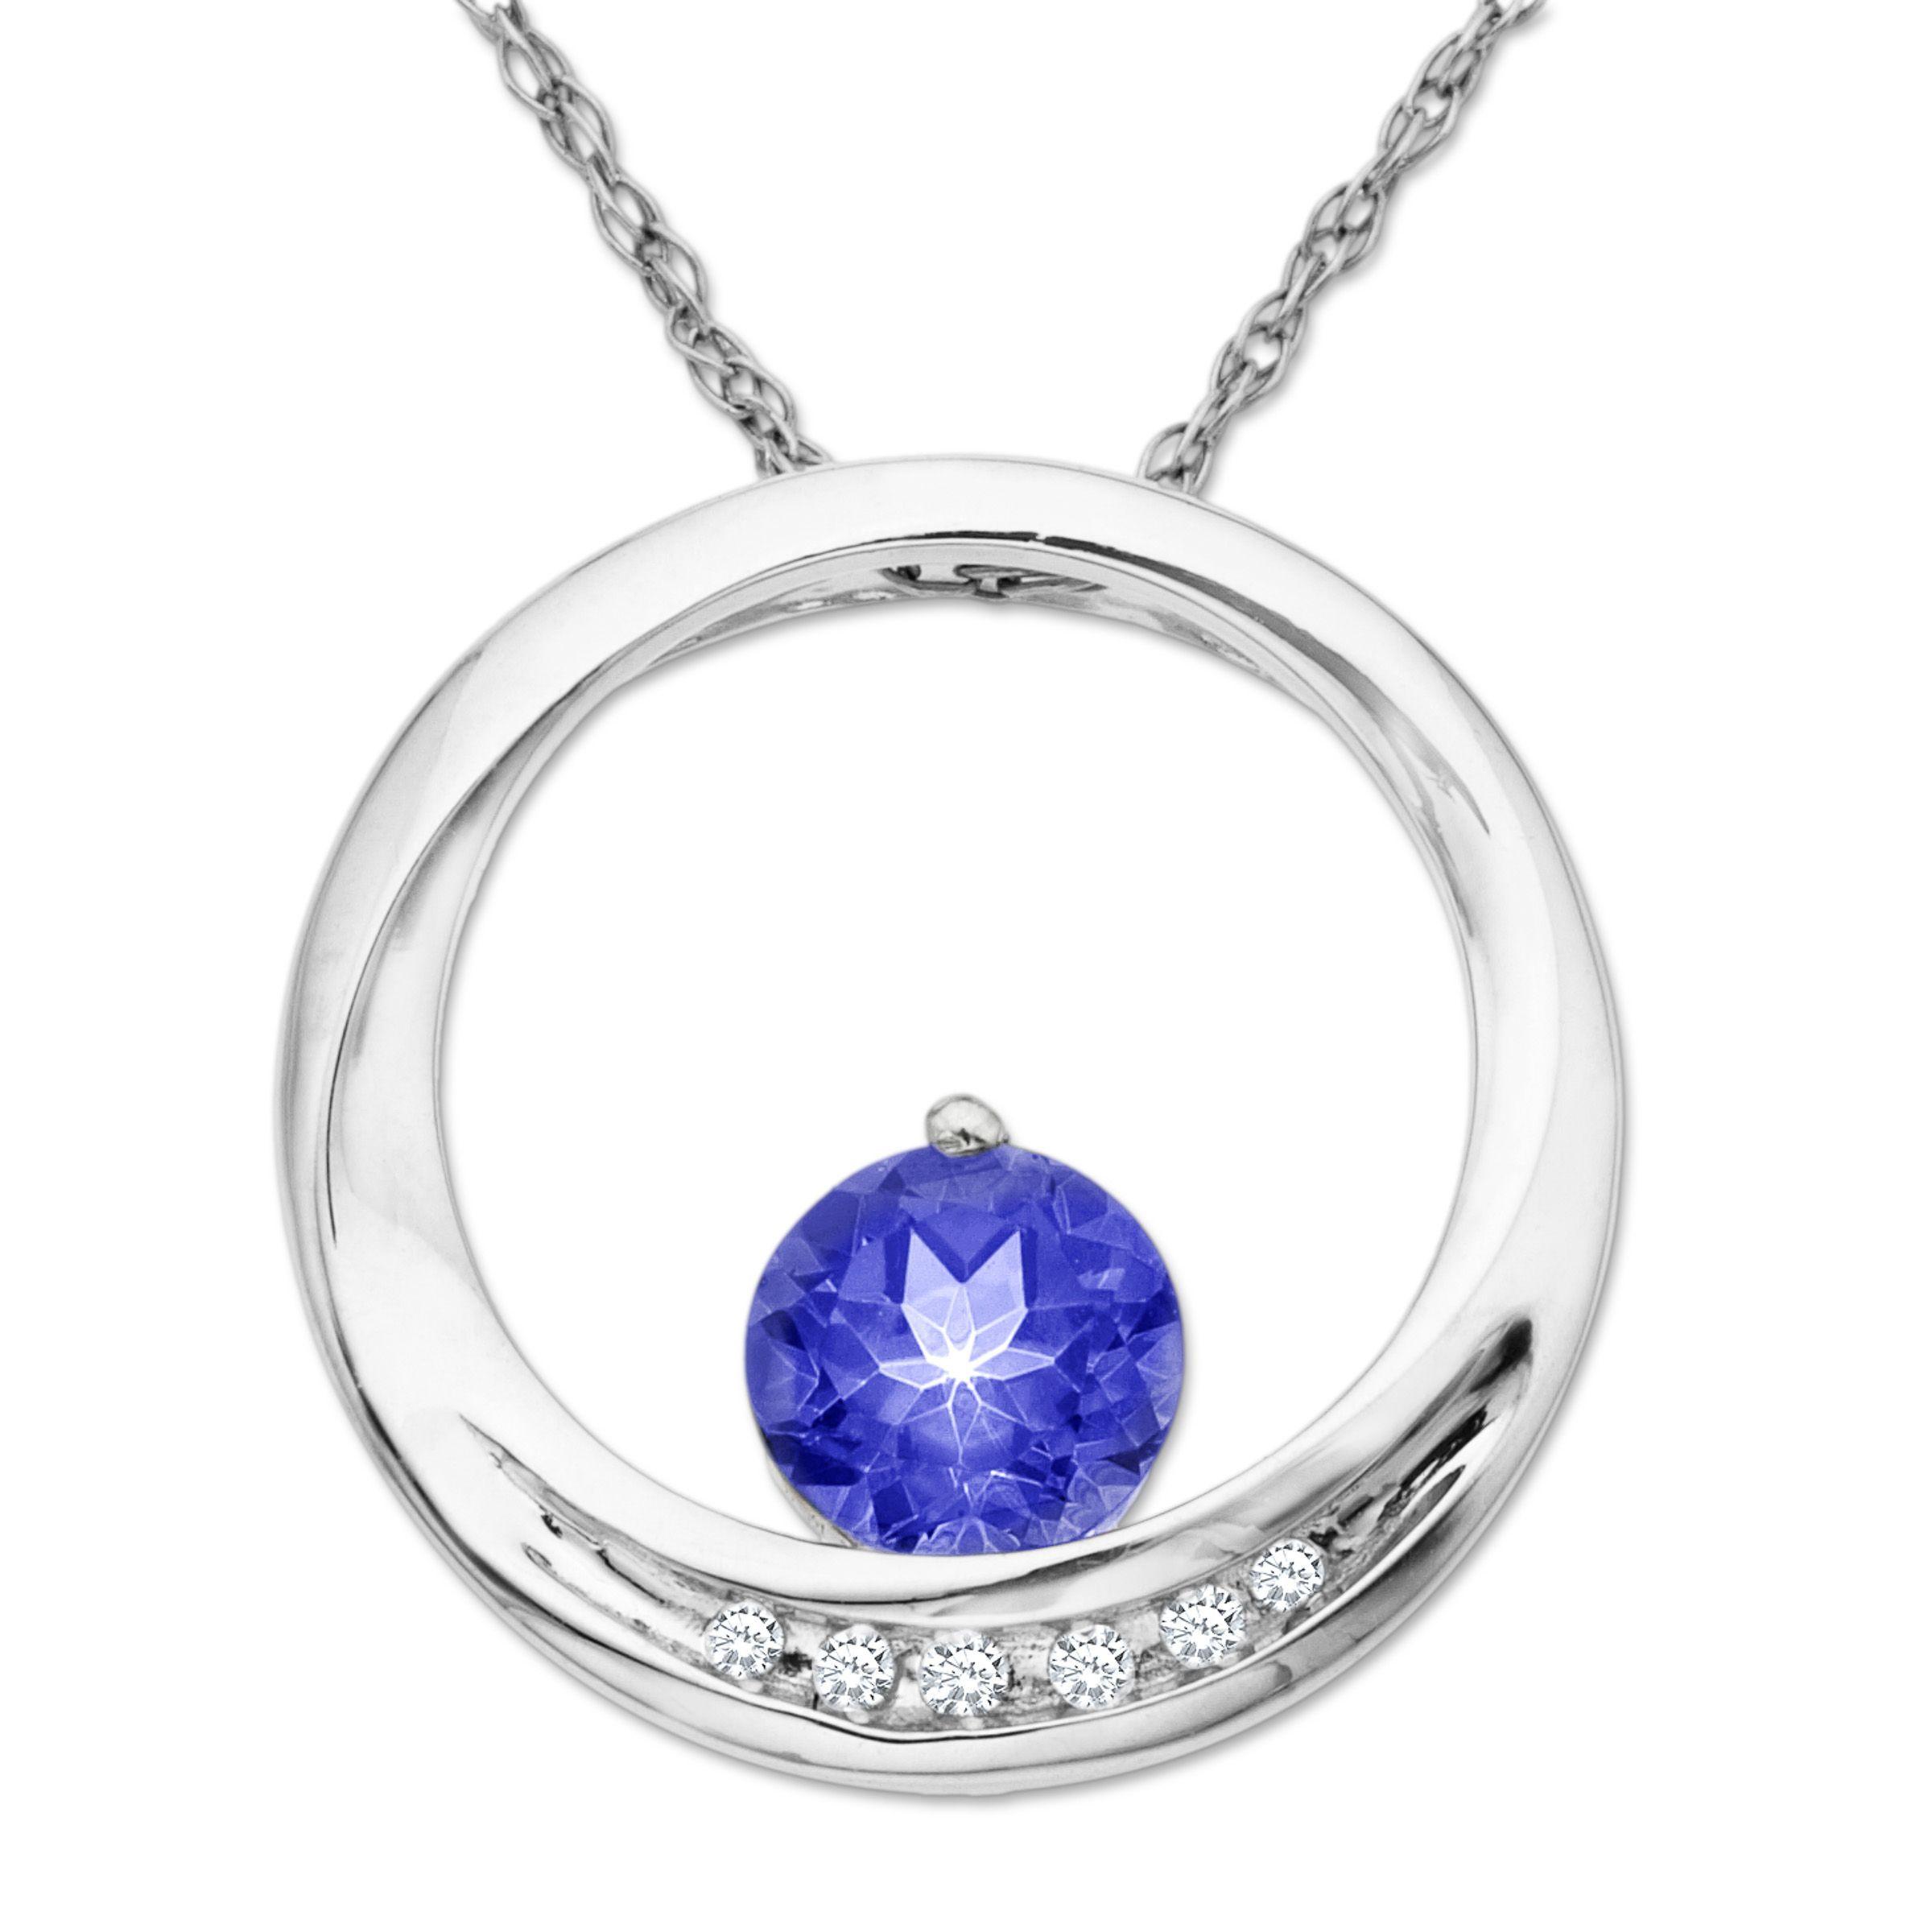 1 16 ct created ceylon sapphire circle pendant with diamonds in 14k 1 16 ct created ceylon sapphire circle pendant with diamonds in 14k white gold mozeypictures Gallery